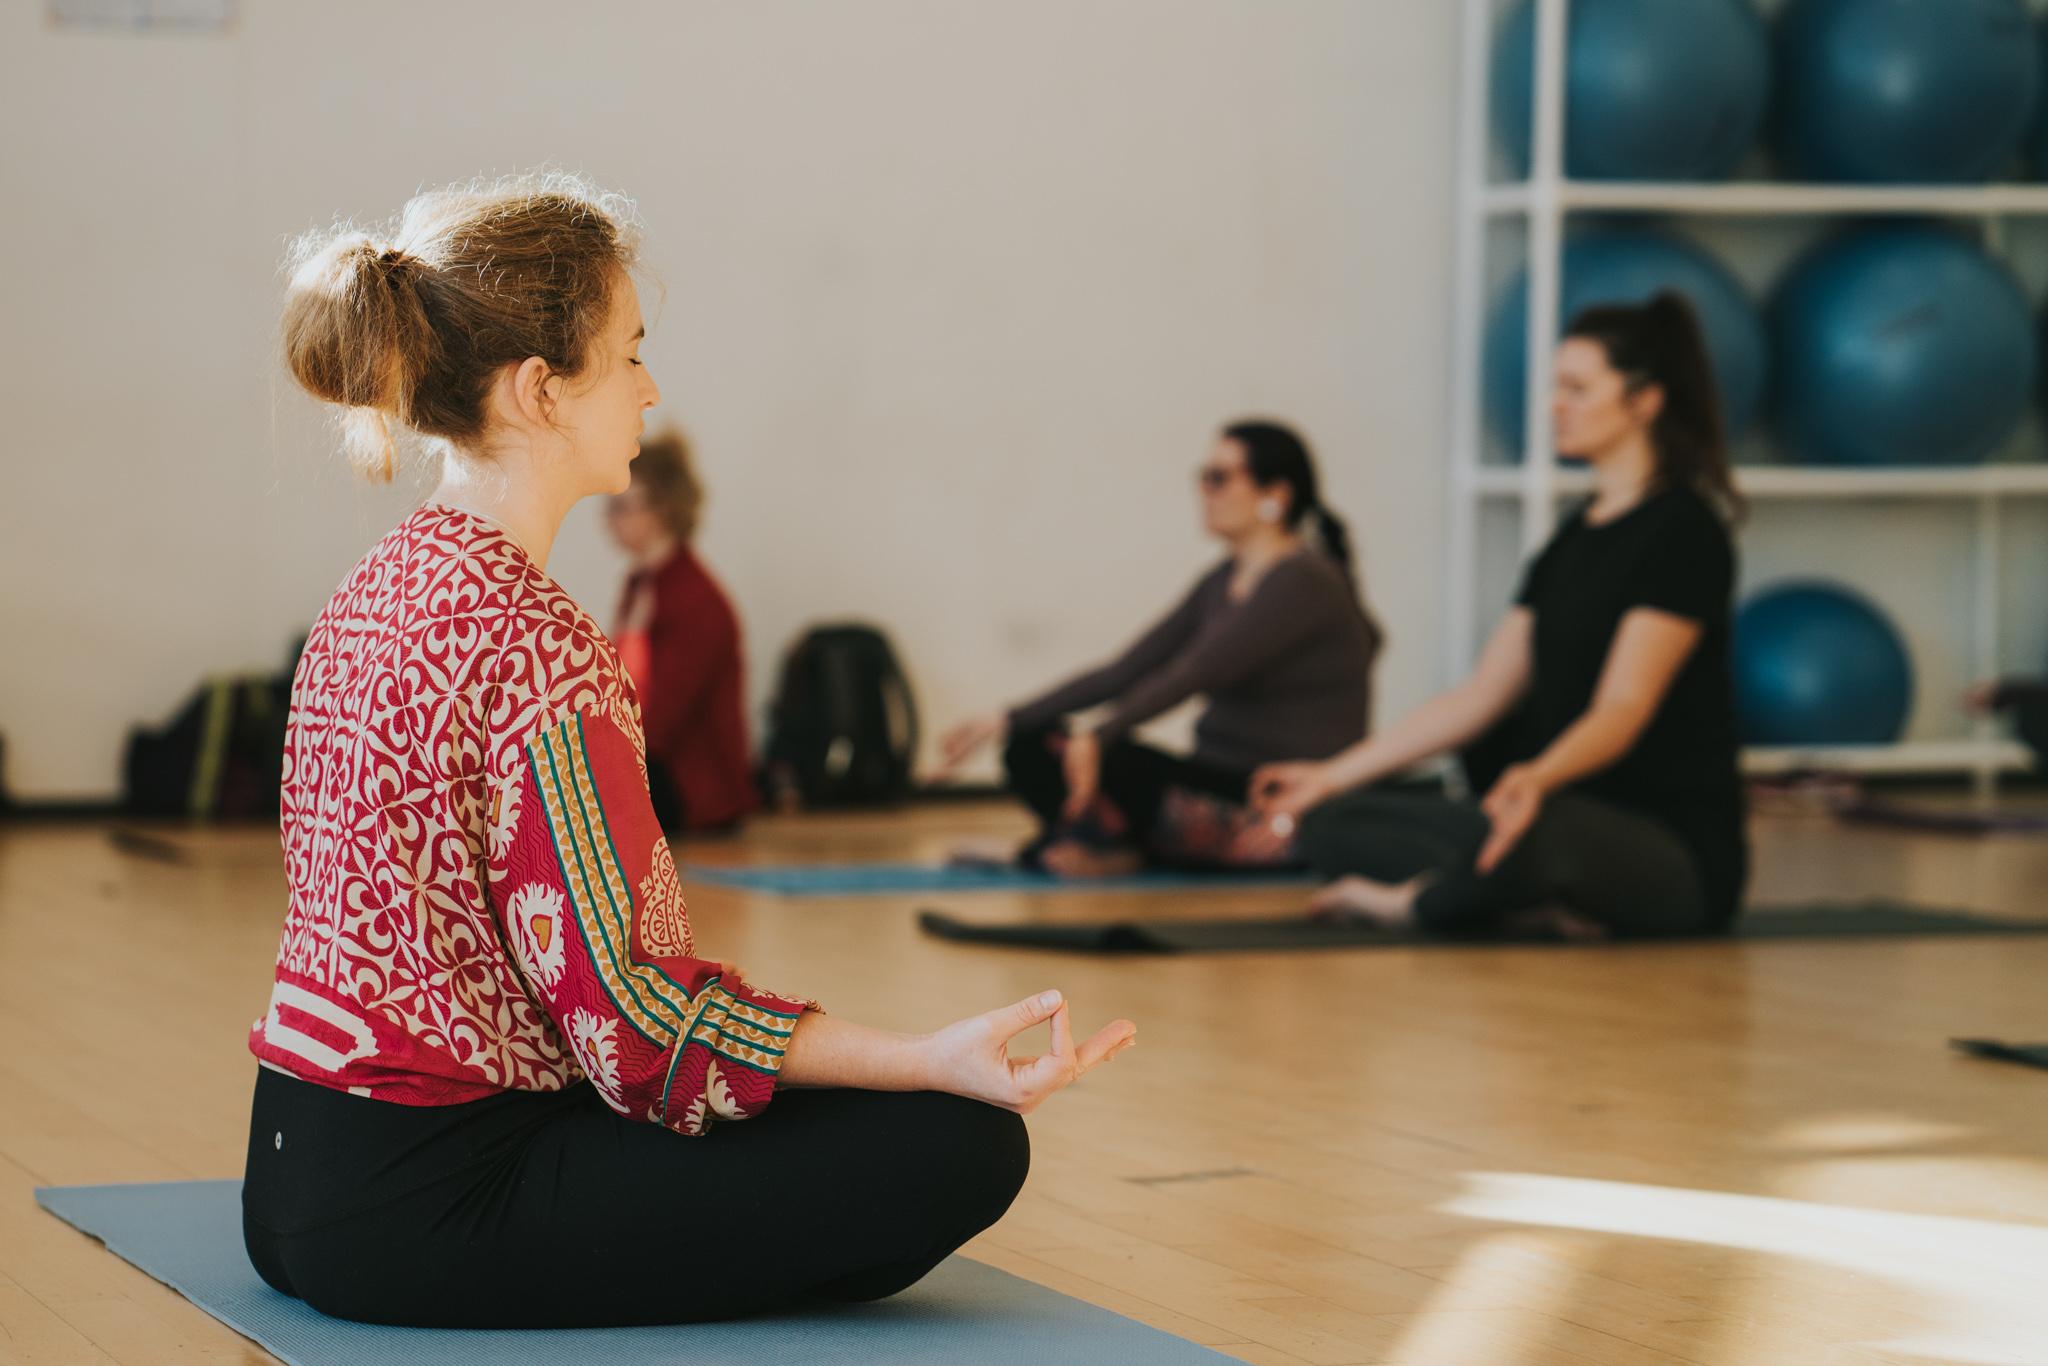 yogific-essex-yoga-vegan-festival-essex-university-grace-elizabeth-colchester-essex-alternative-wedding-lifestyle-photographer-suffolk-norfolk-devon-london-vegan-nights-cruelty-free (6 of 73).jpg